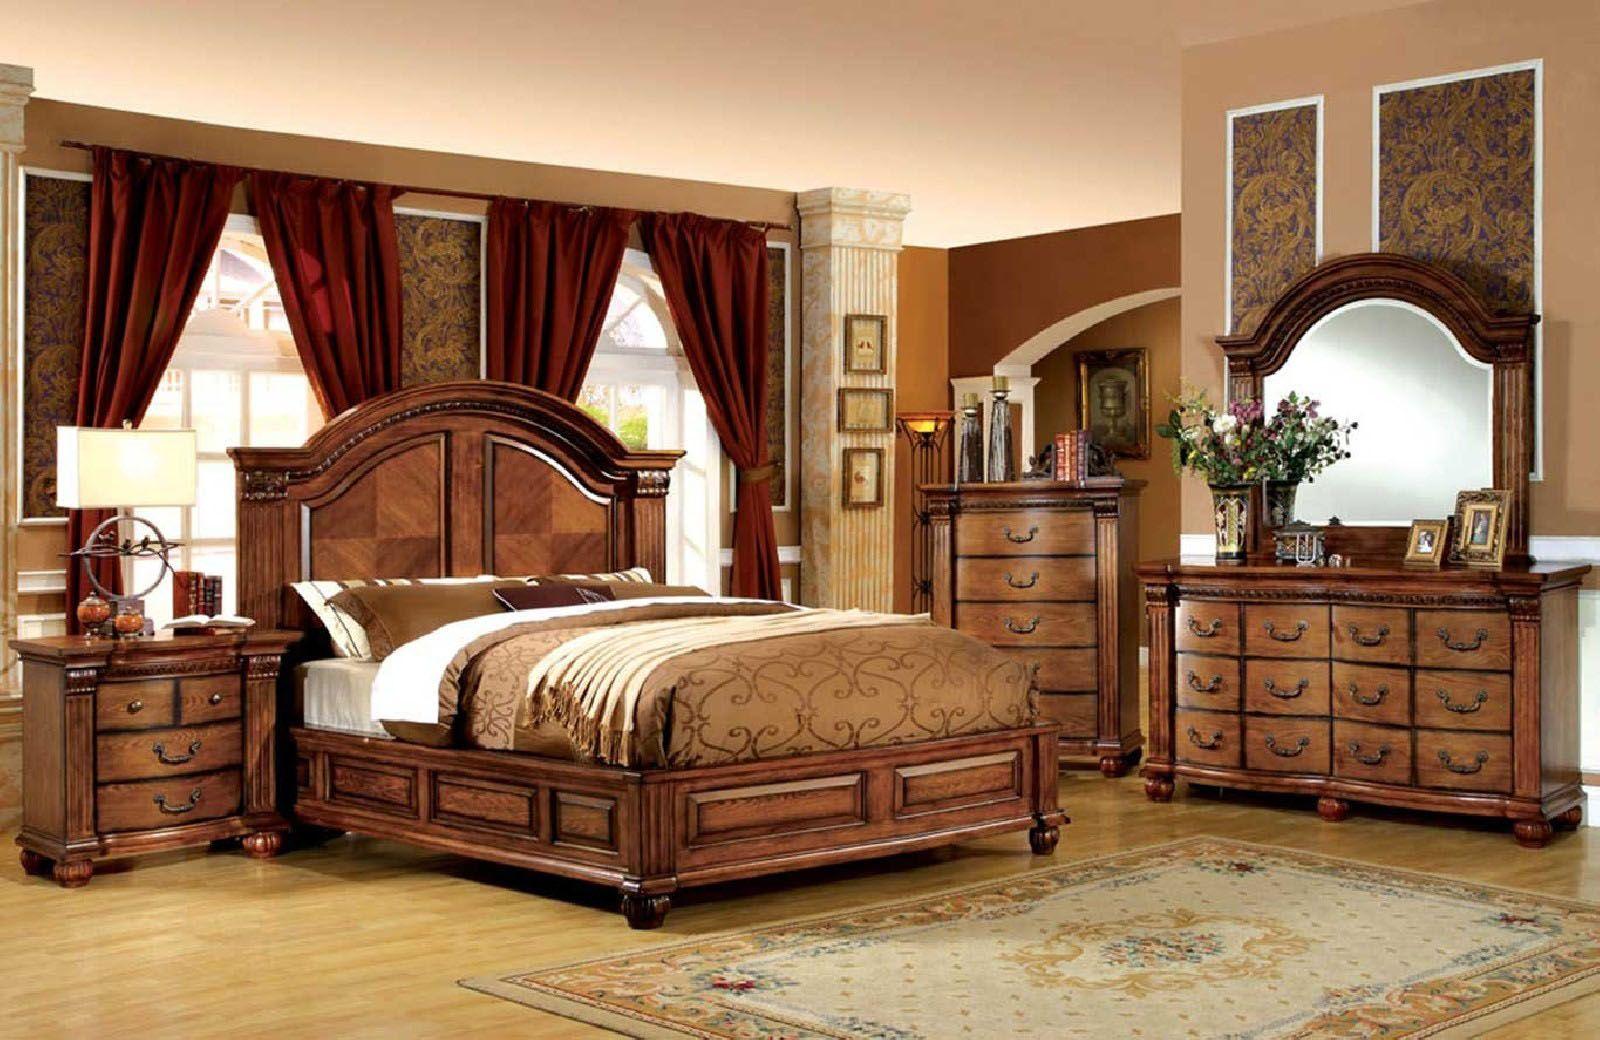 Furniture Of America Bellagrand 4pc Panel Bedroom Set In Antique Tobacco Oak In 2021 King Bedroom Sets Wood Bedroom Sets King Bedroom Furniture